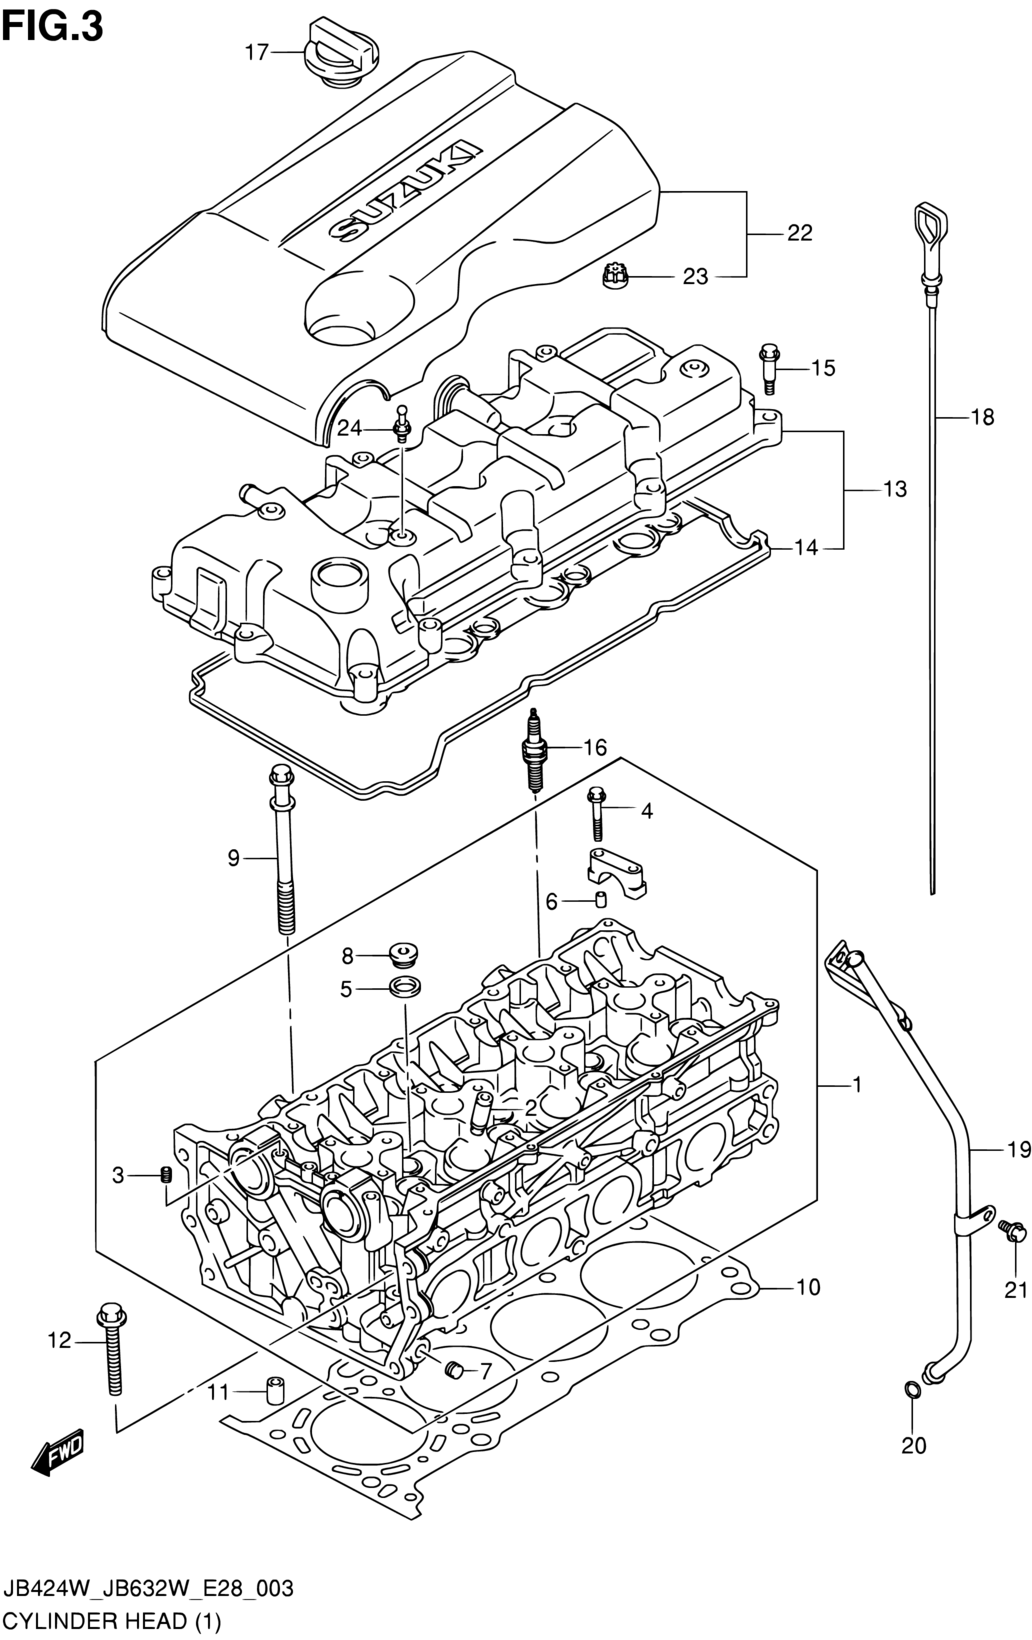 2009 Suzuki Grand Vitara Engine Diagram - seniorsclub.it solid-growth -  solid-growth.pietrodavico.itdiagram database